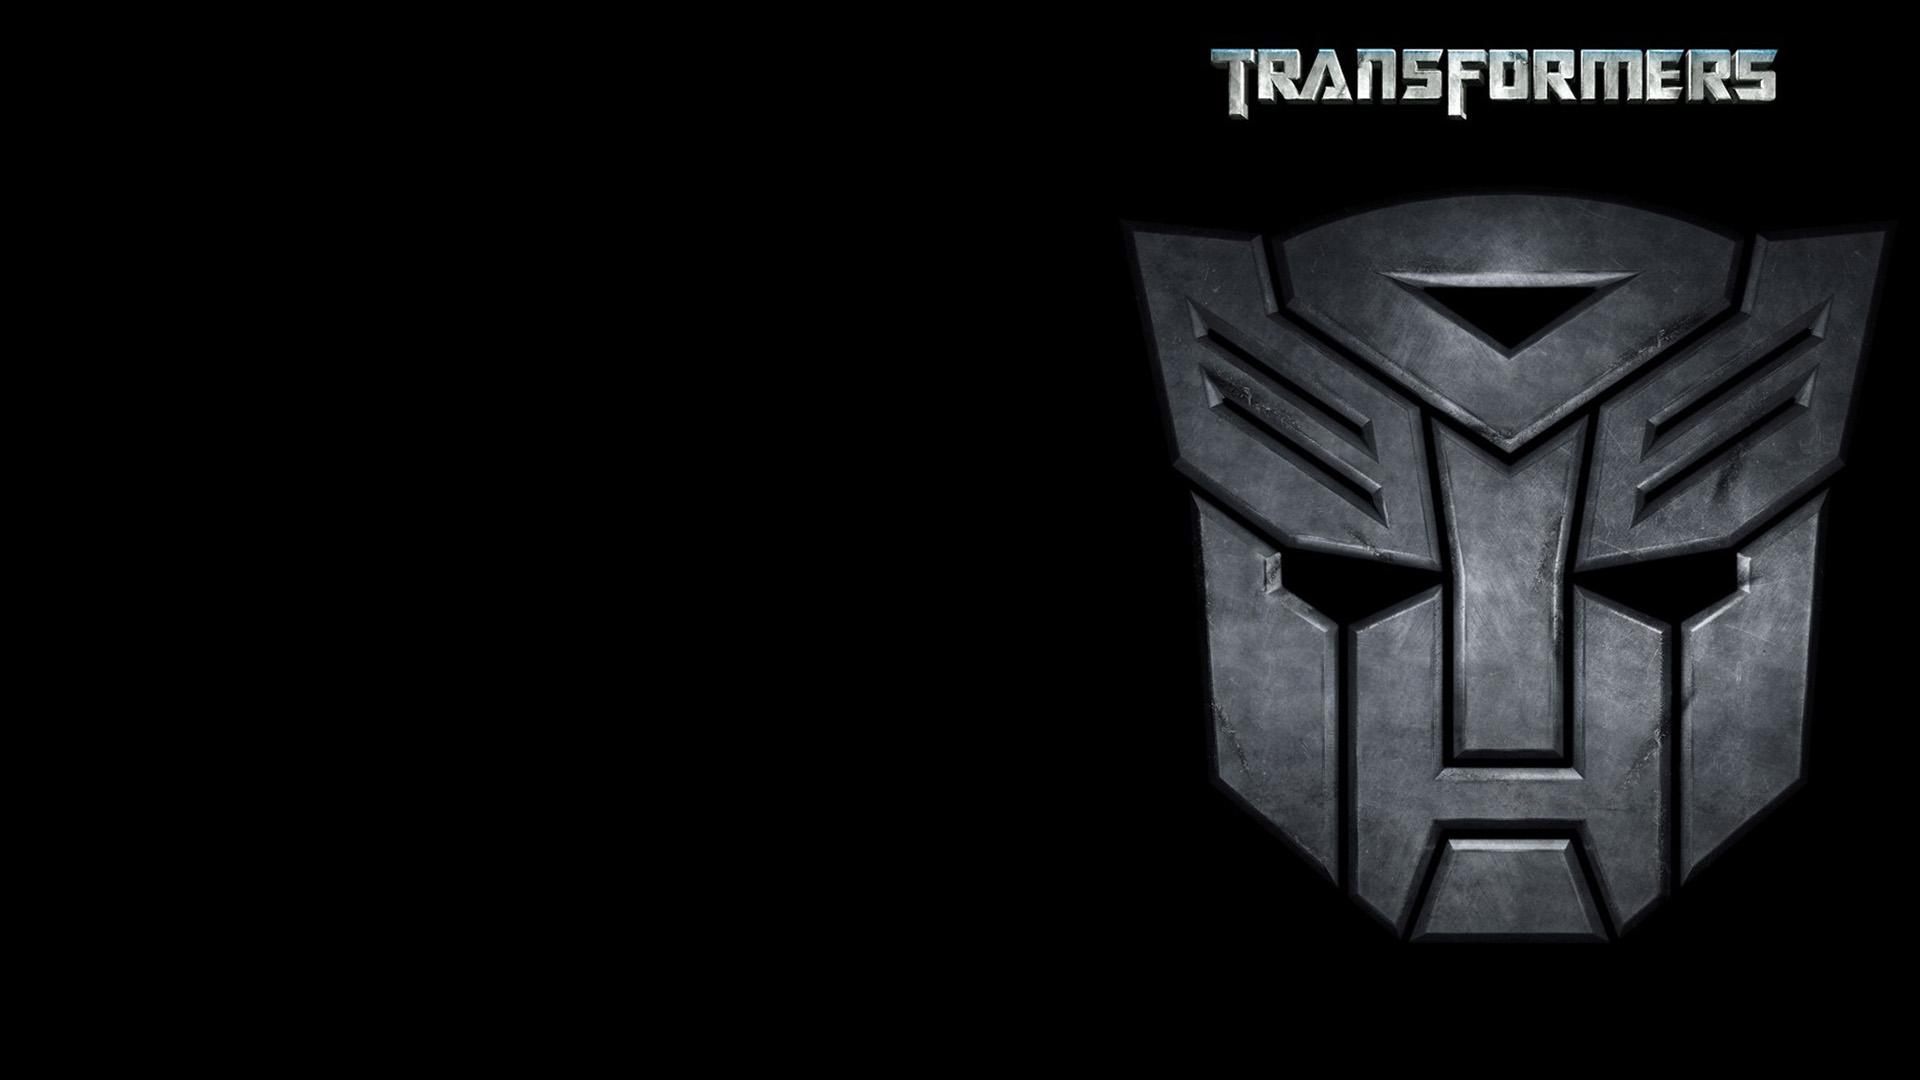 Wallpaper Transformers Logo